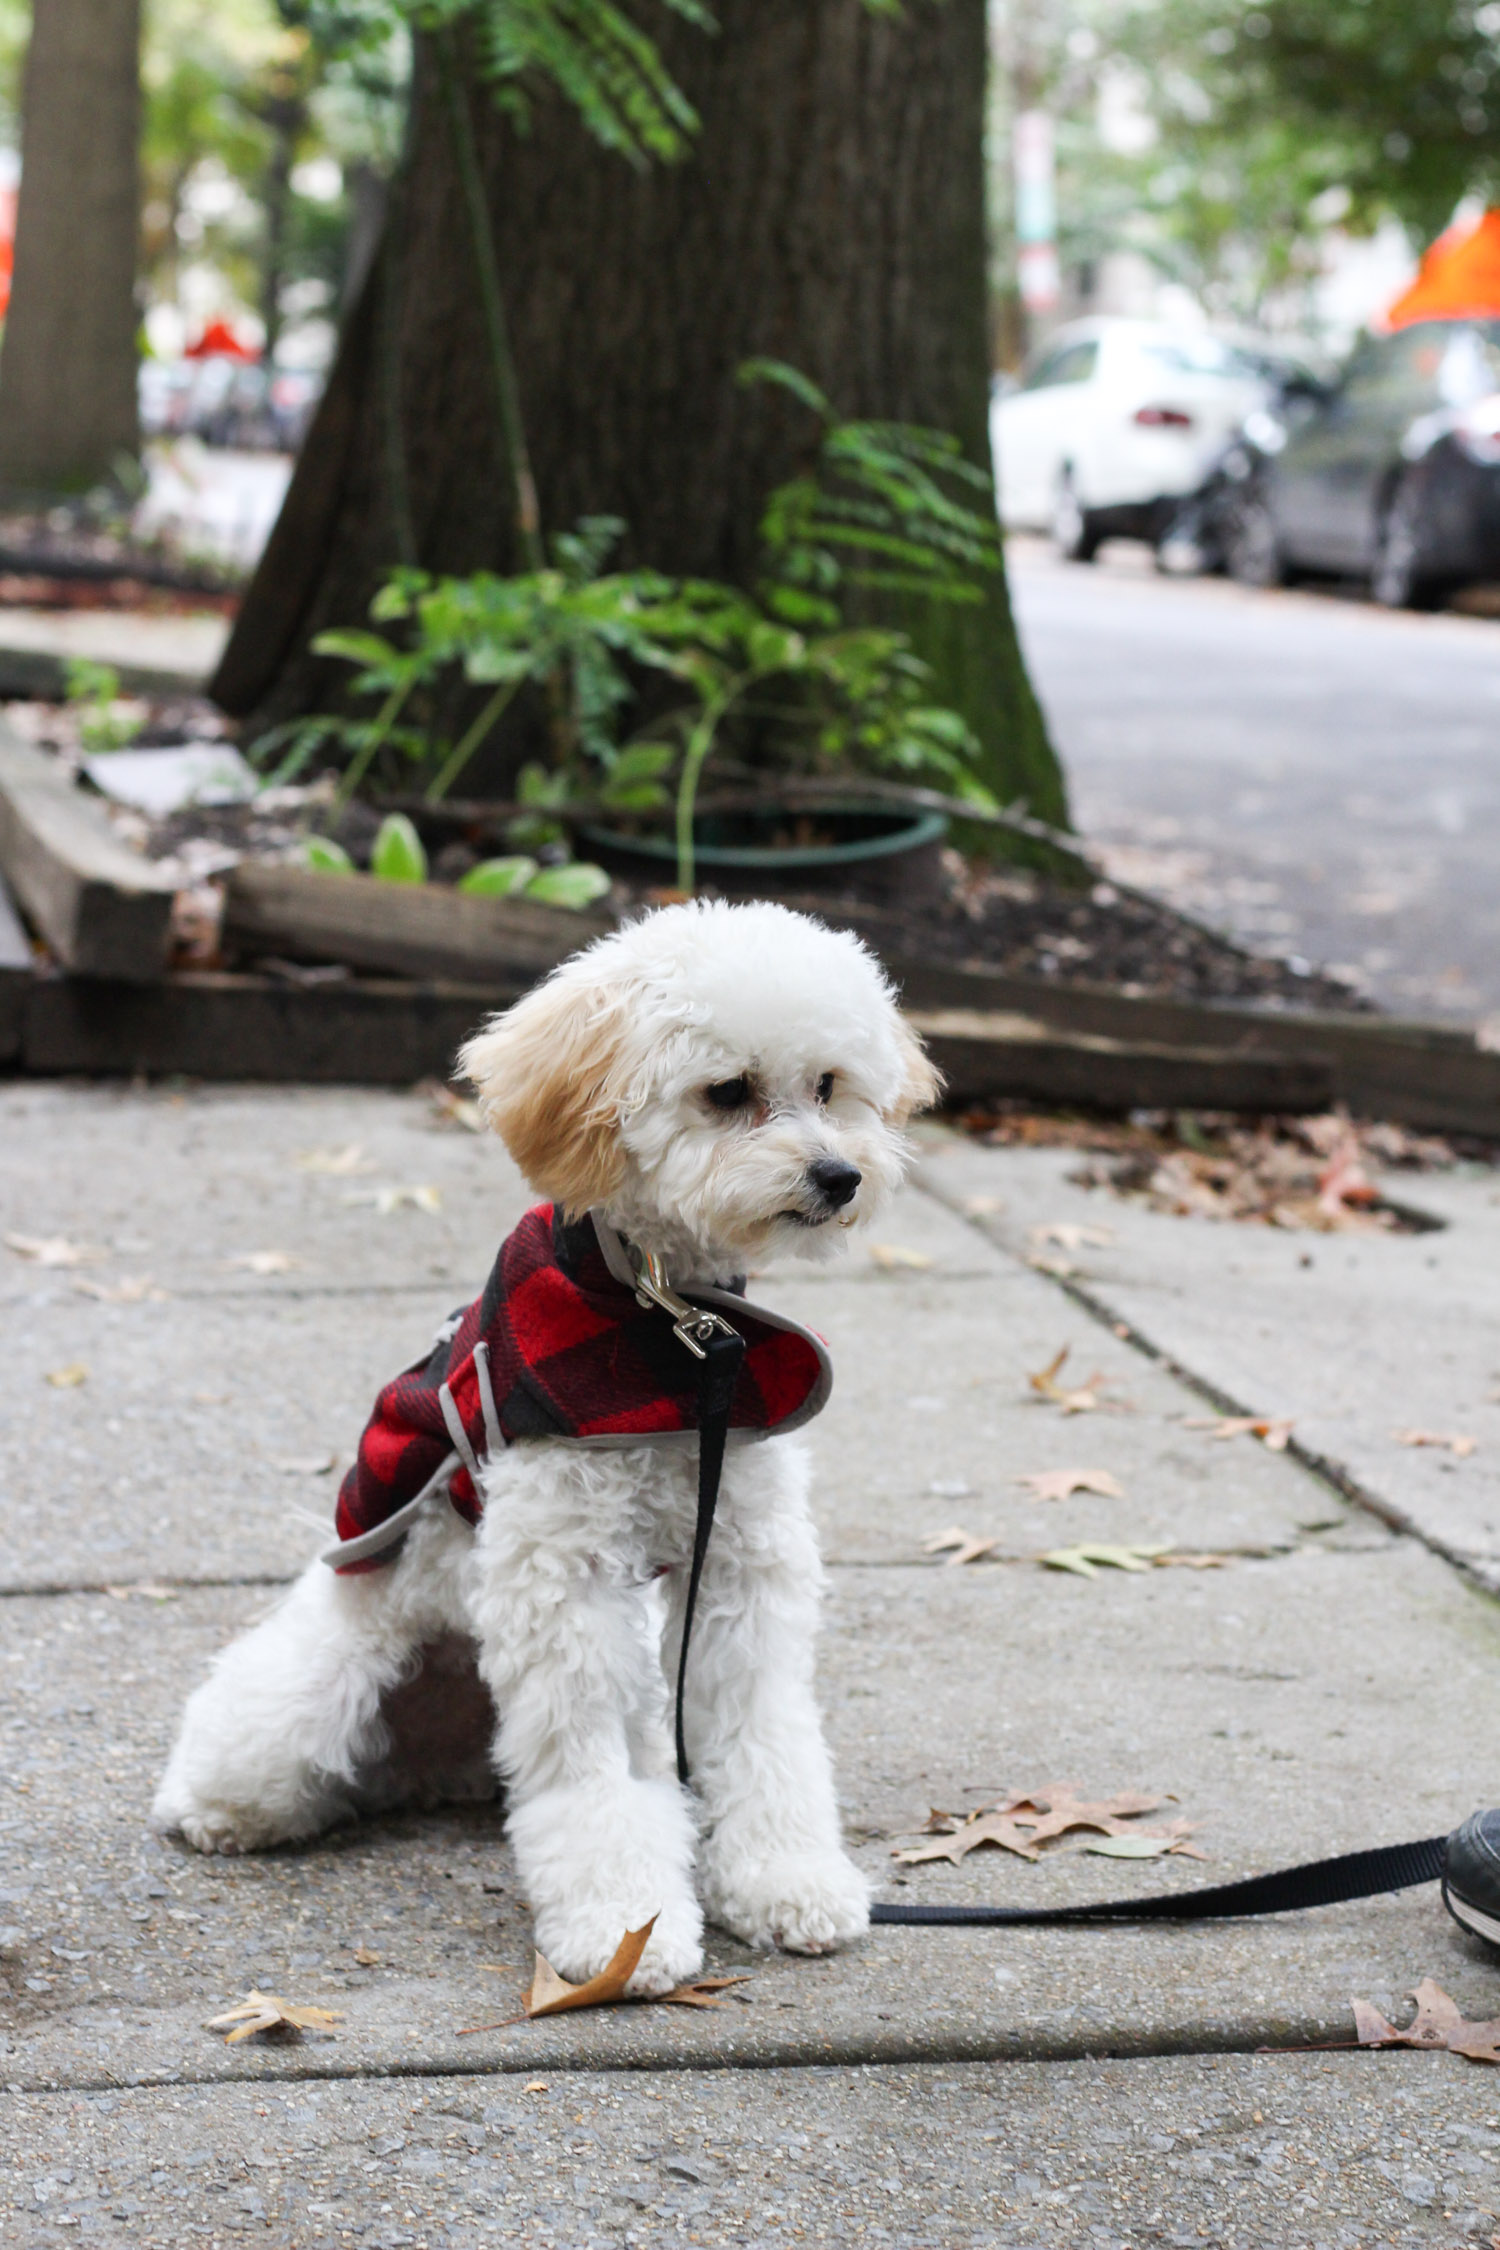 LL Bean Sweater Fleece review by DC fashion blogger, Monica Dutia